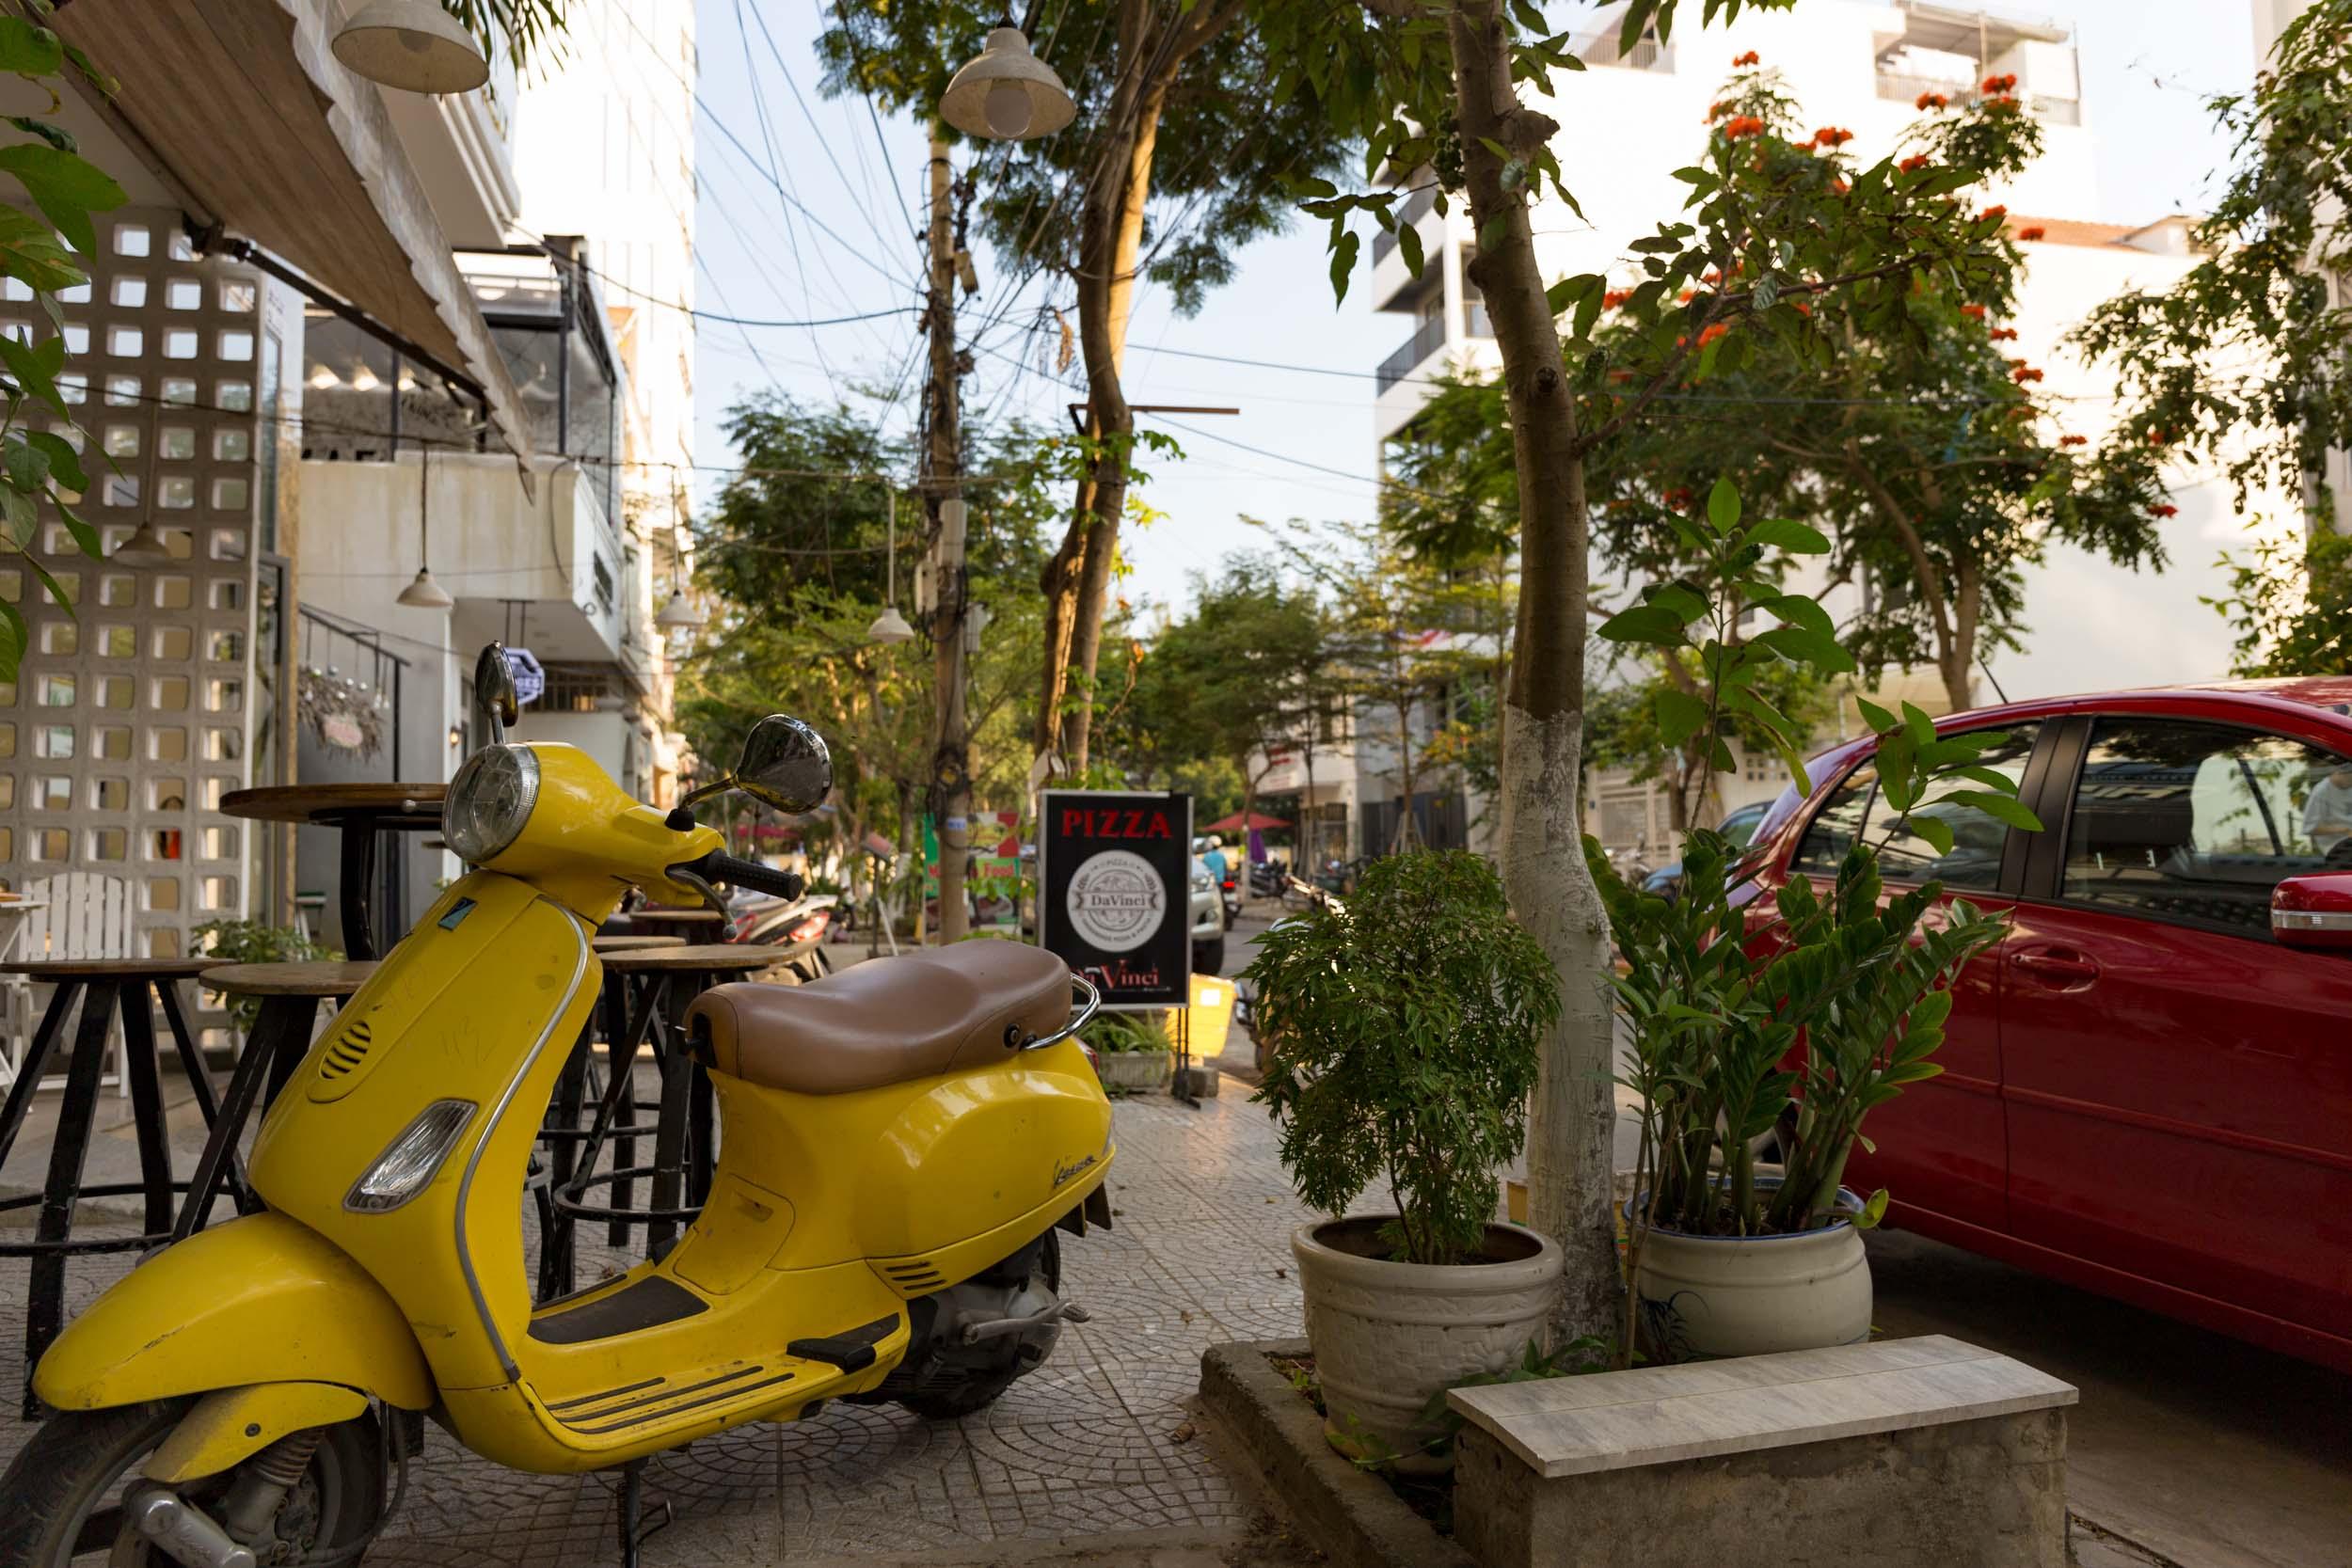 Colourful moped outside da vinci's pizza joint.